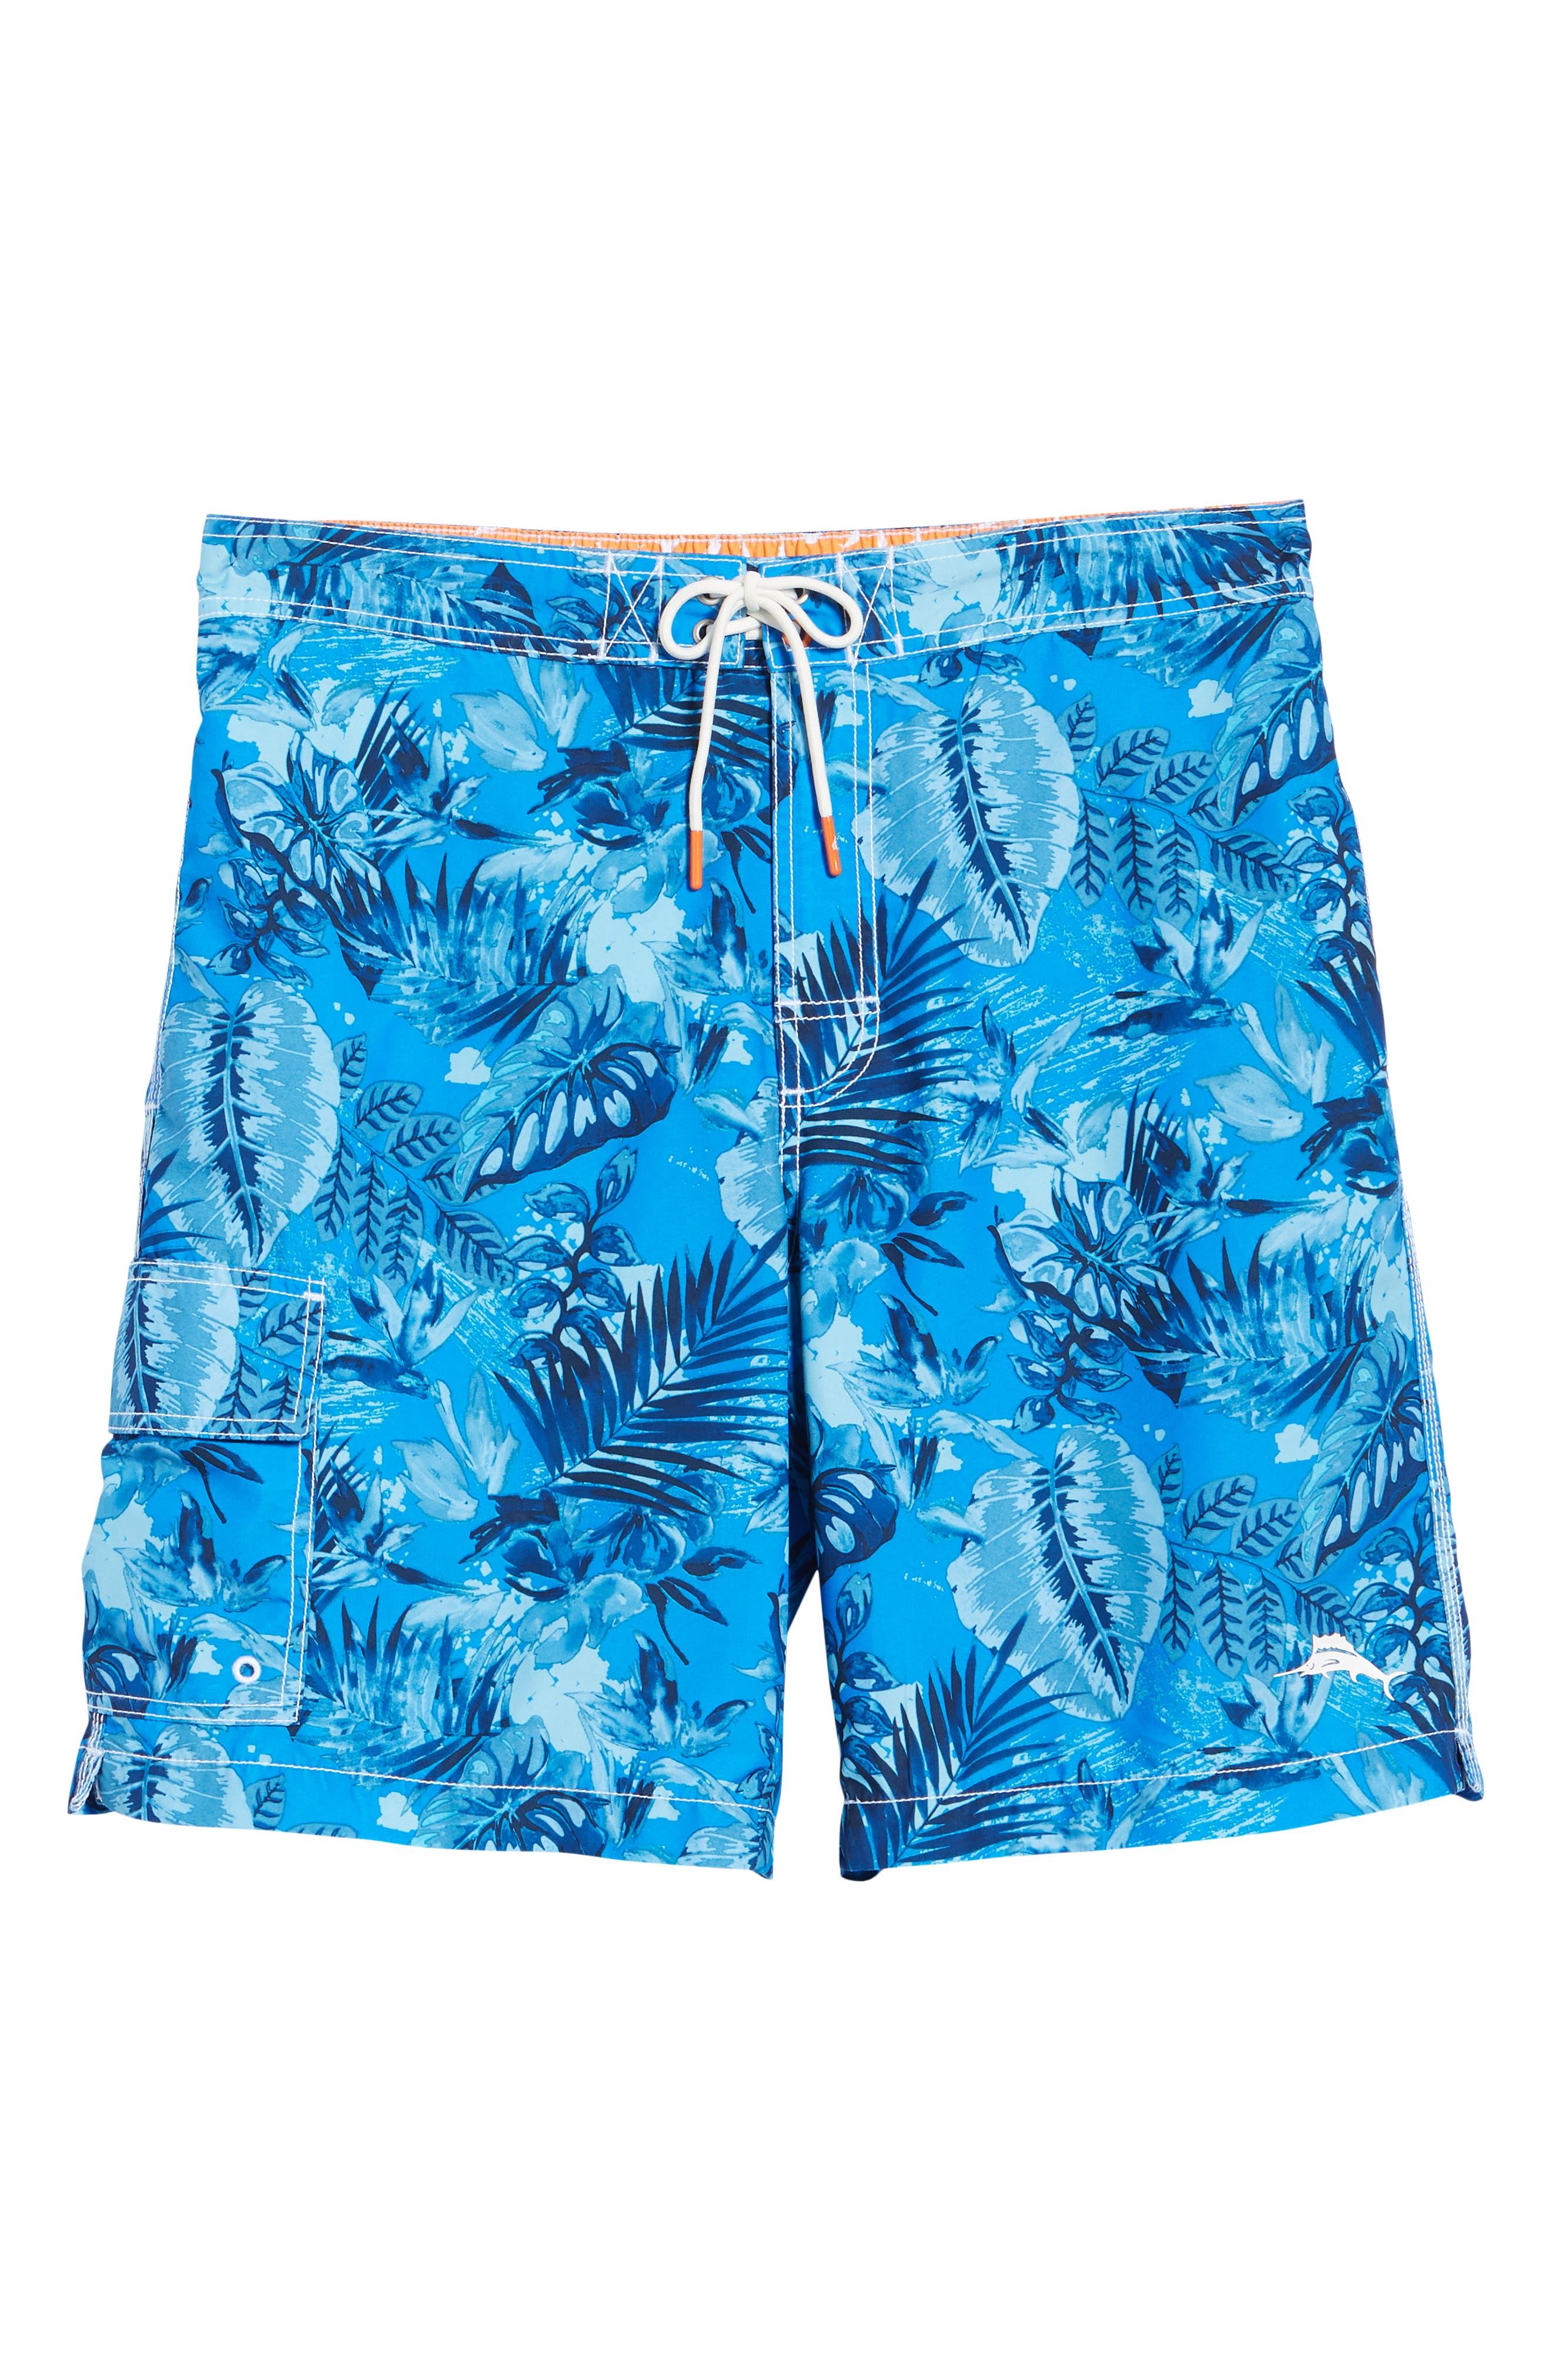 TOMMY BAHAMA,                             Baja Selva Shores Board Shorts,                             Alternate thumbnail 6, color,                             400